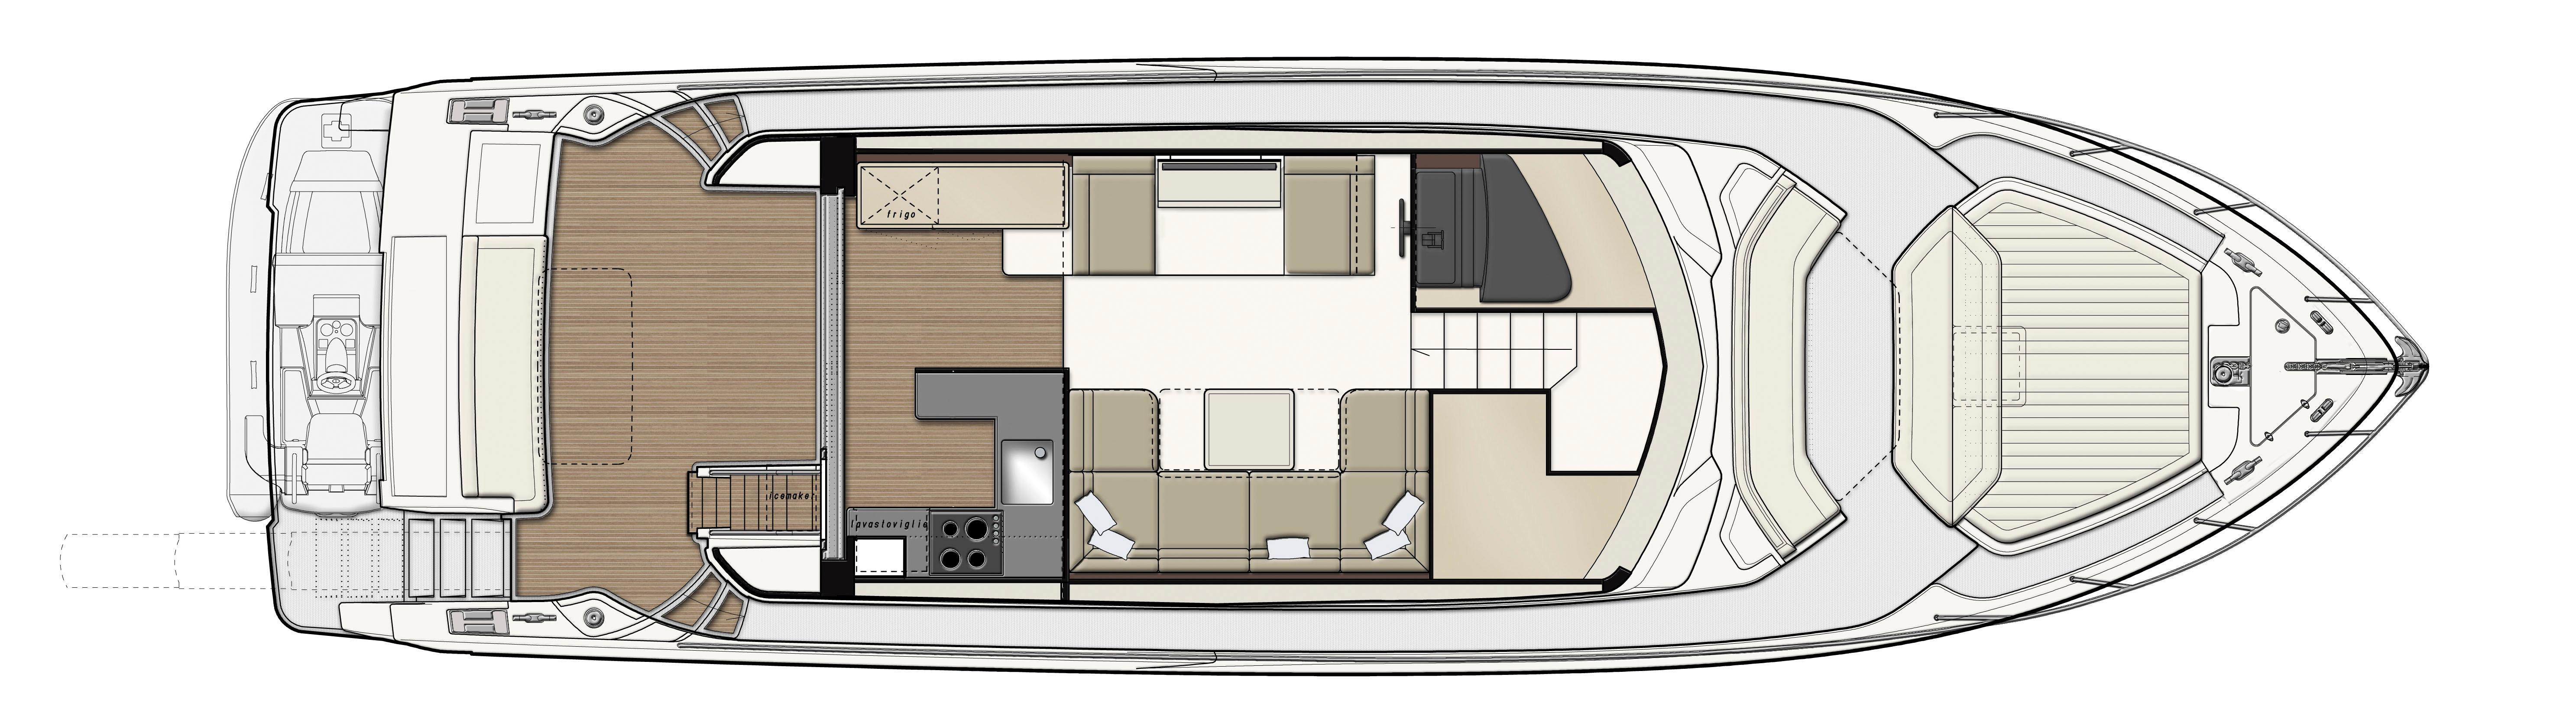 Ferretti 550 Upper Deck Layout Plan